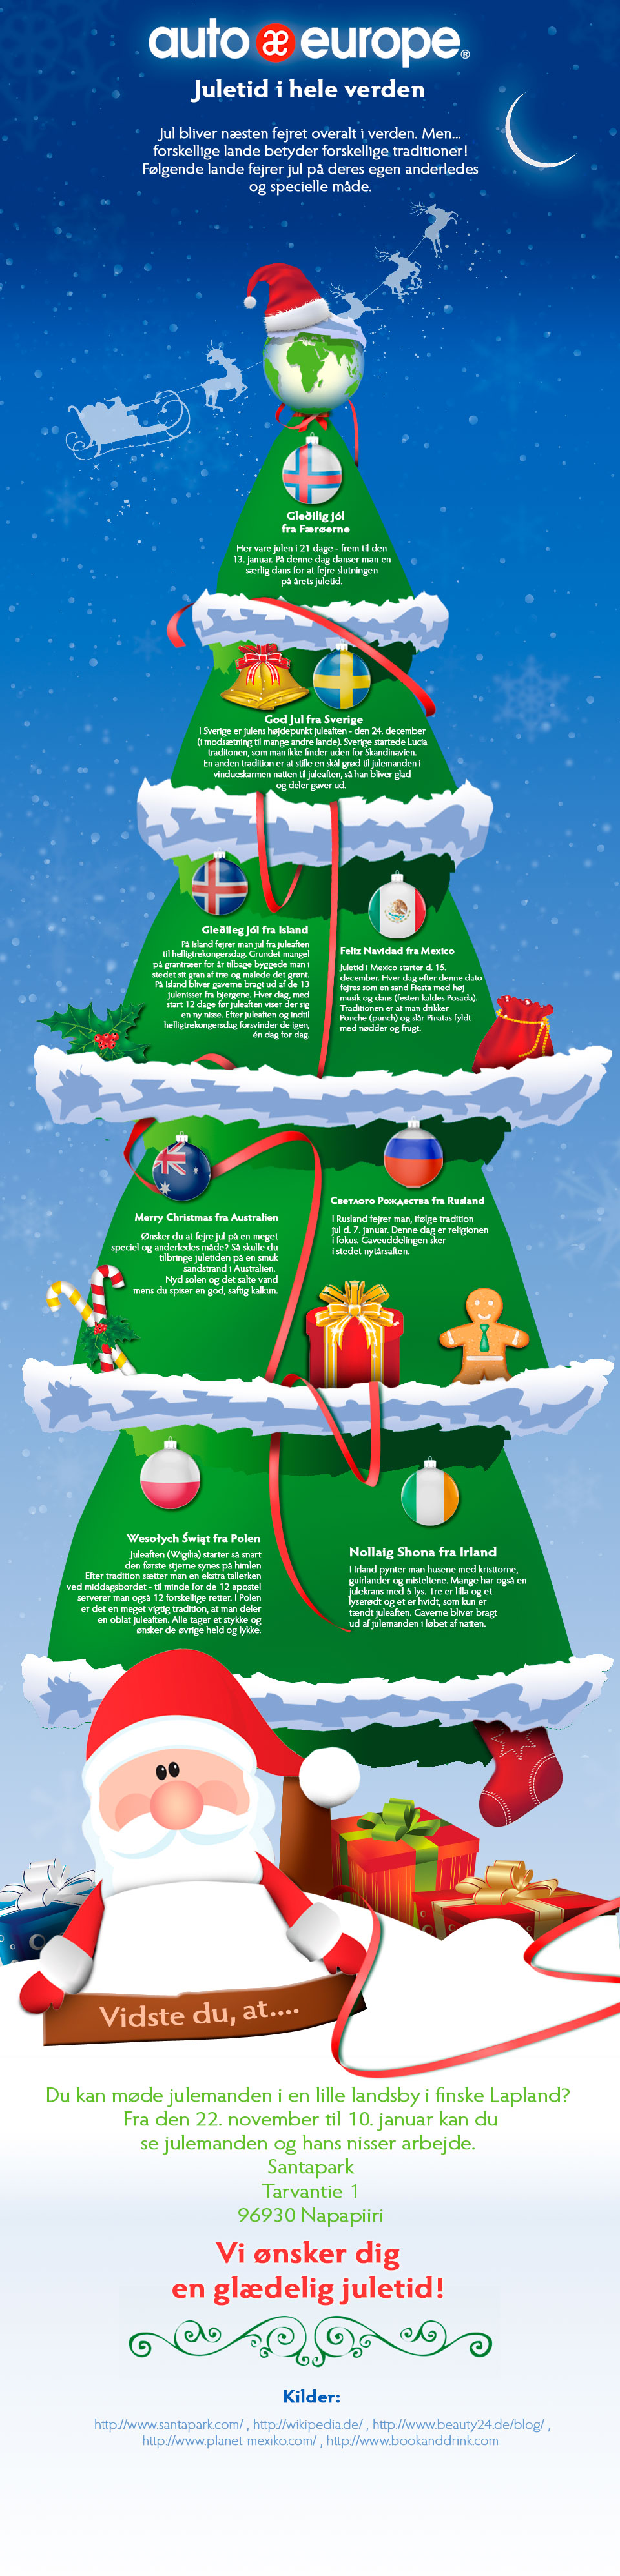 Julen verden over - Infografik Auto Europe